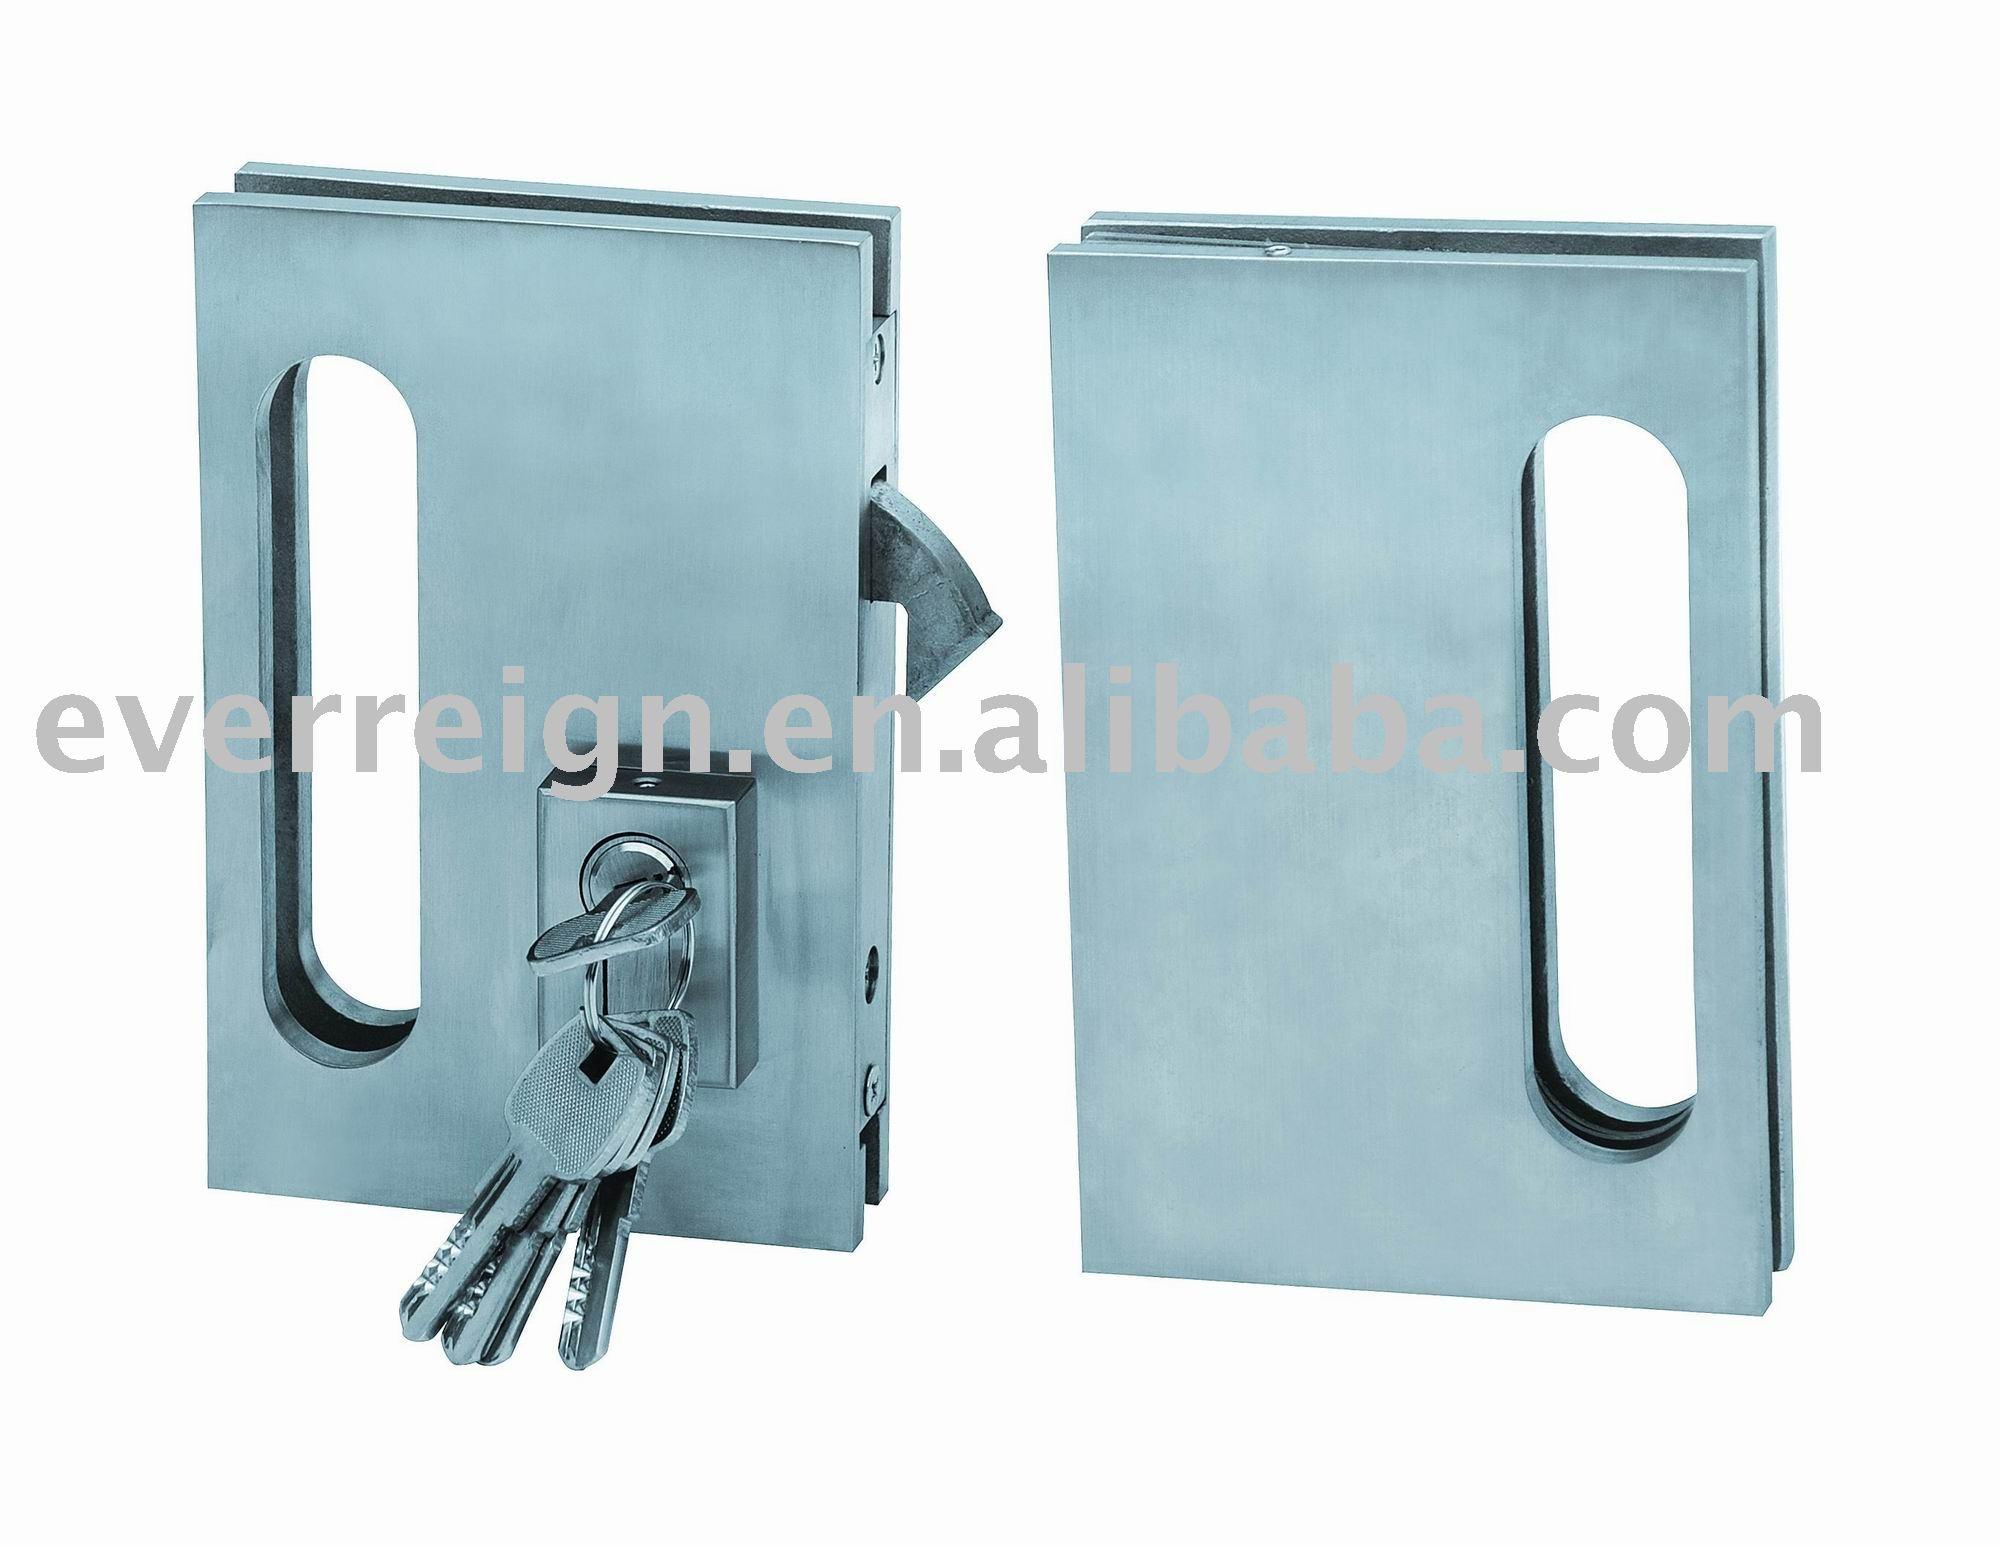 Locking Sliding Glass Door Hardware2000 X 1545